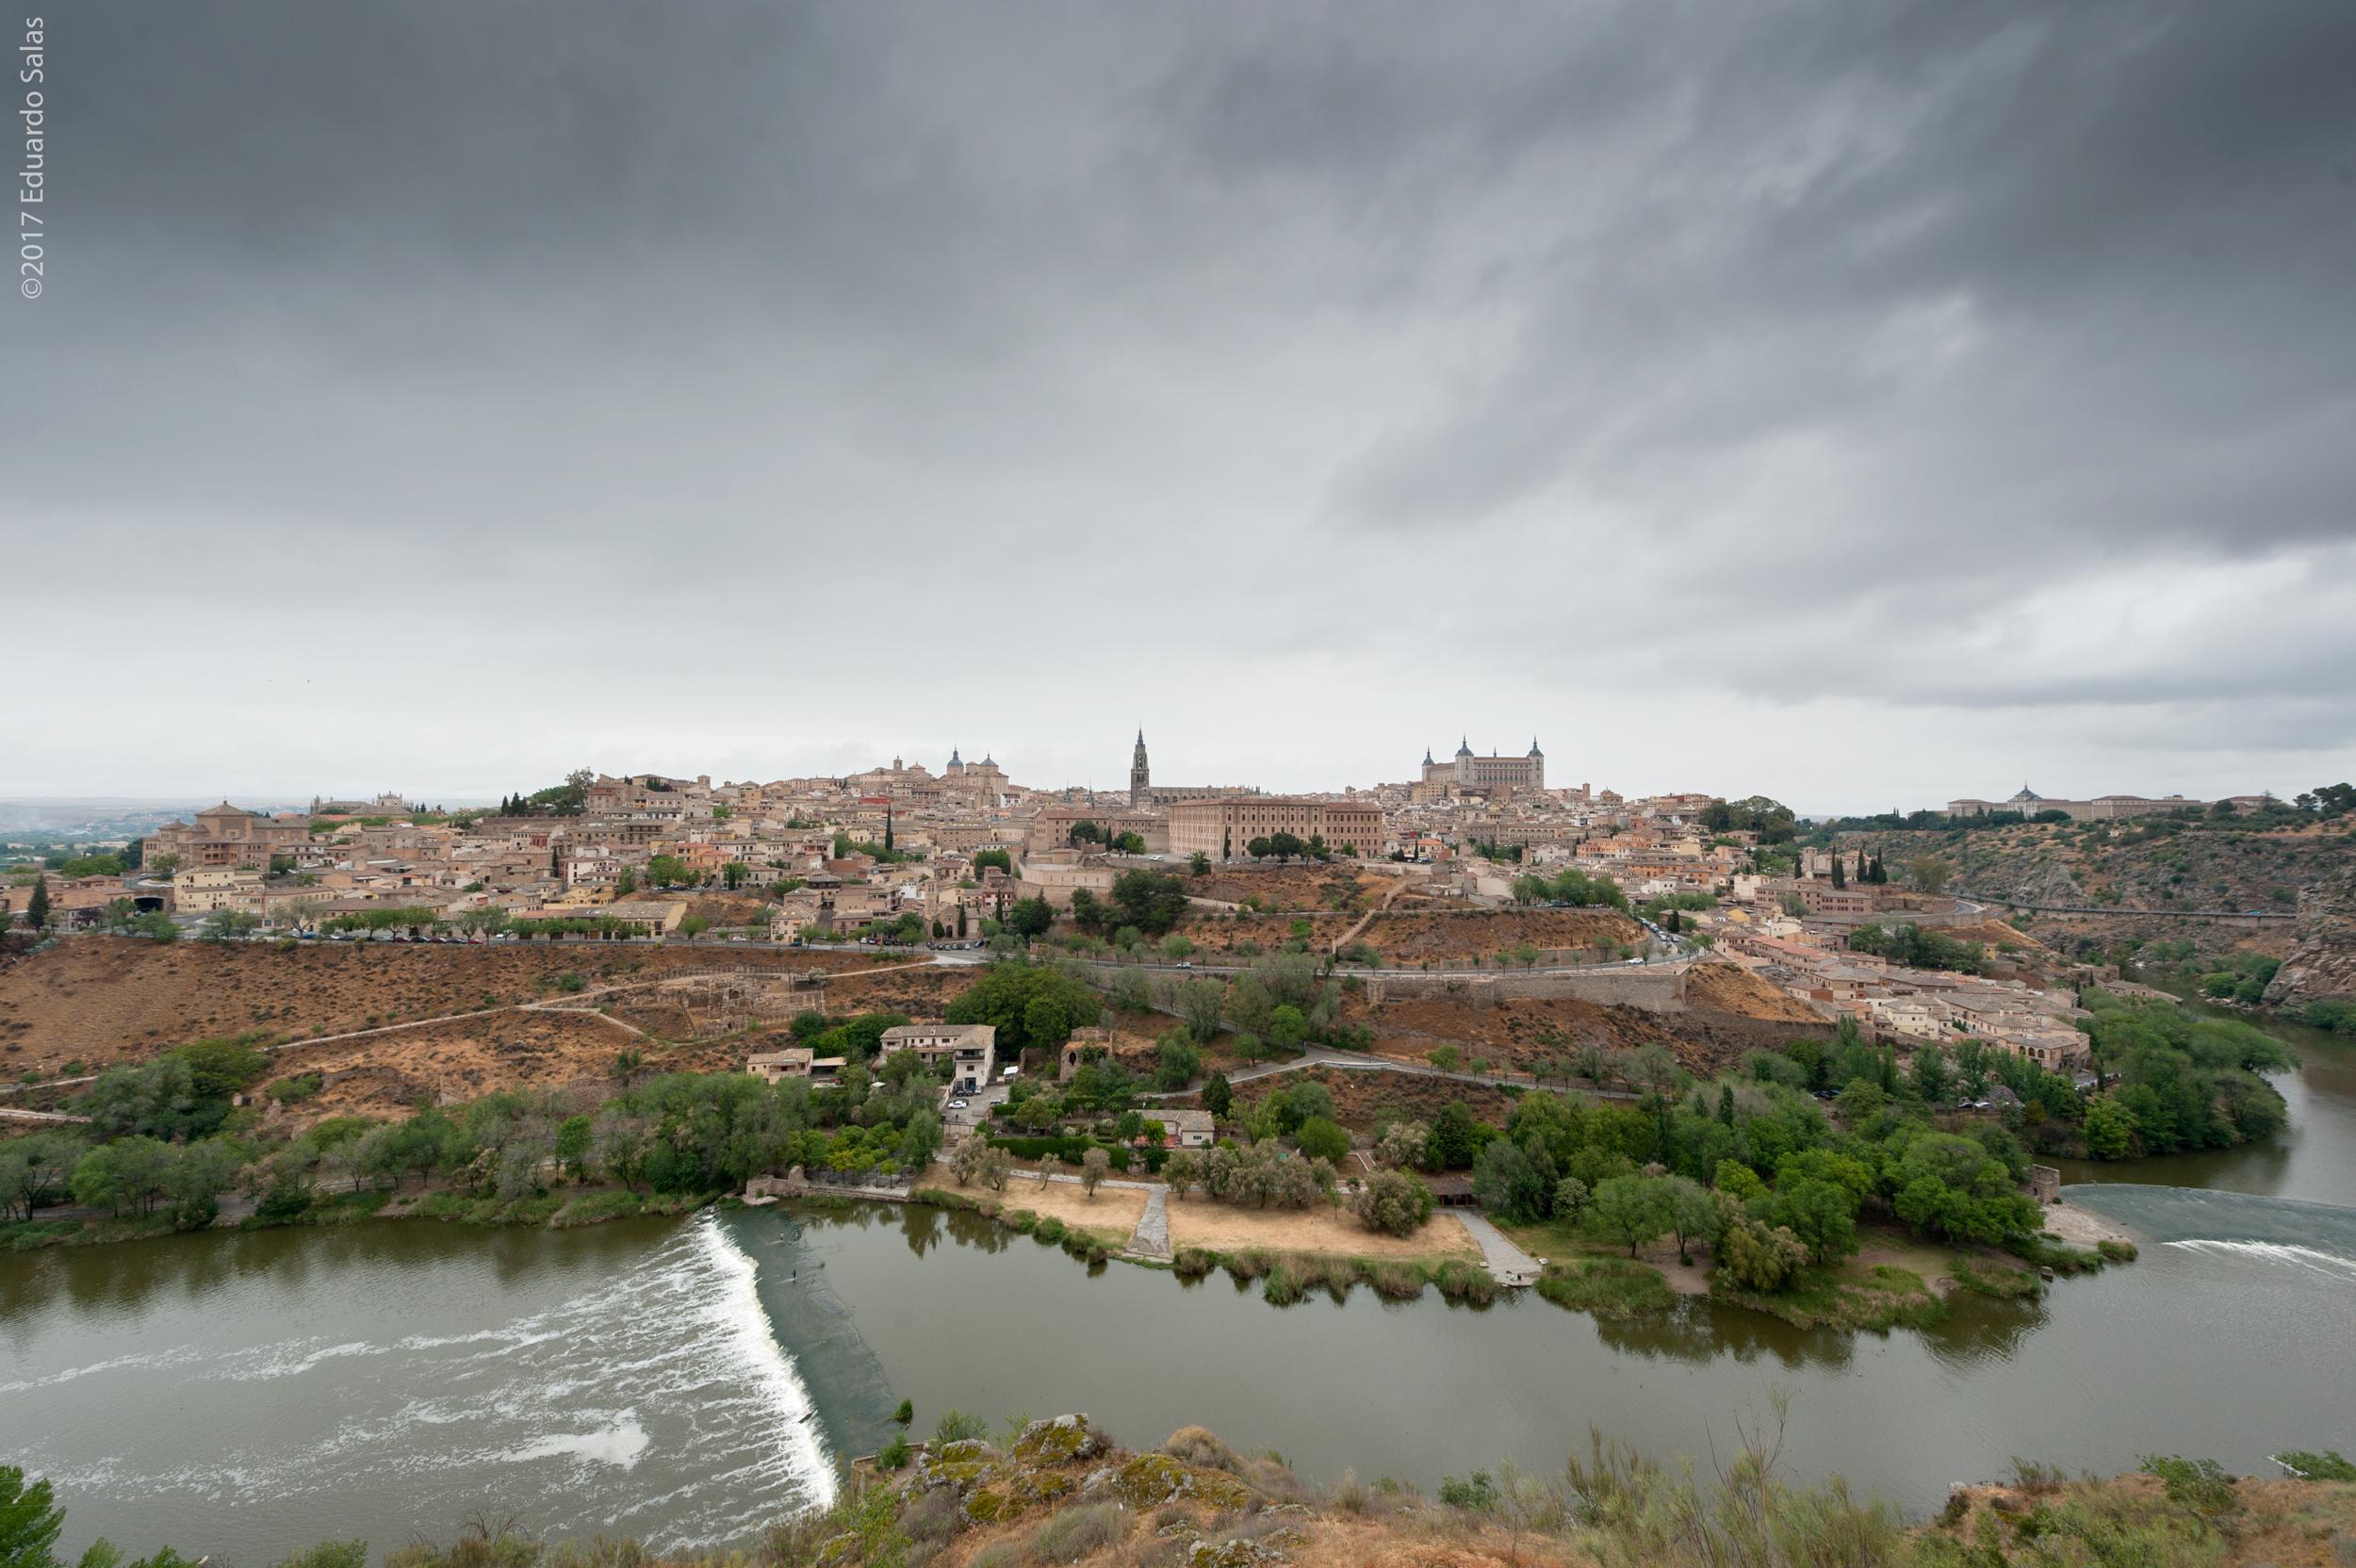 llueve-en-toledo_33534617943_o